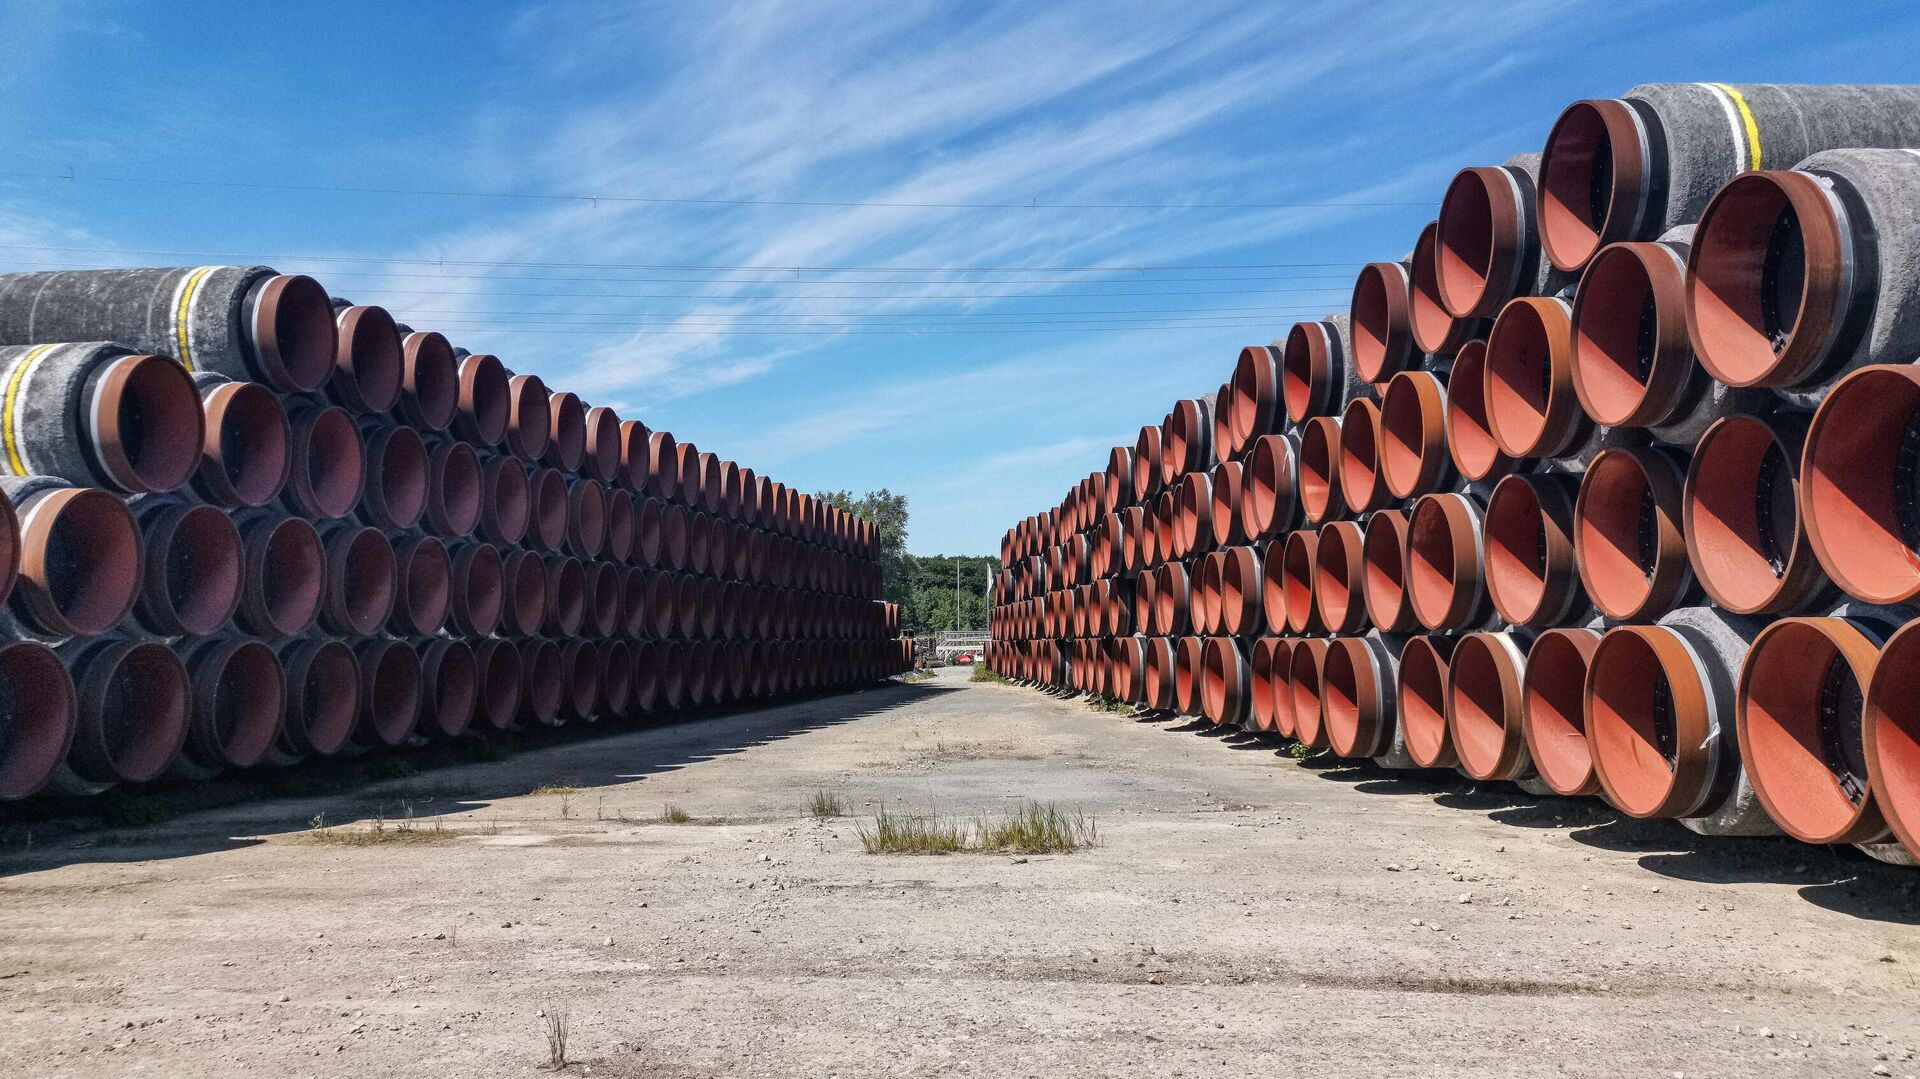 Трубы в немецком порту Мукран на острове Рюген - РИА Новости, 1920, 01.12.2020